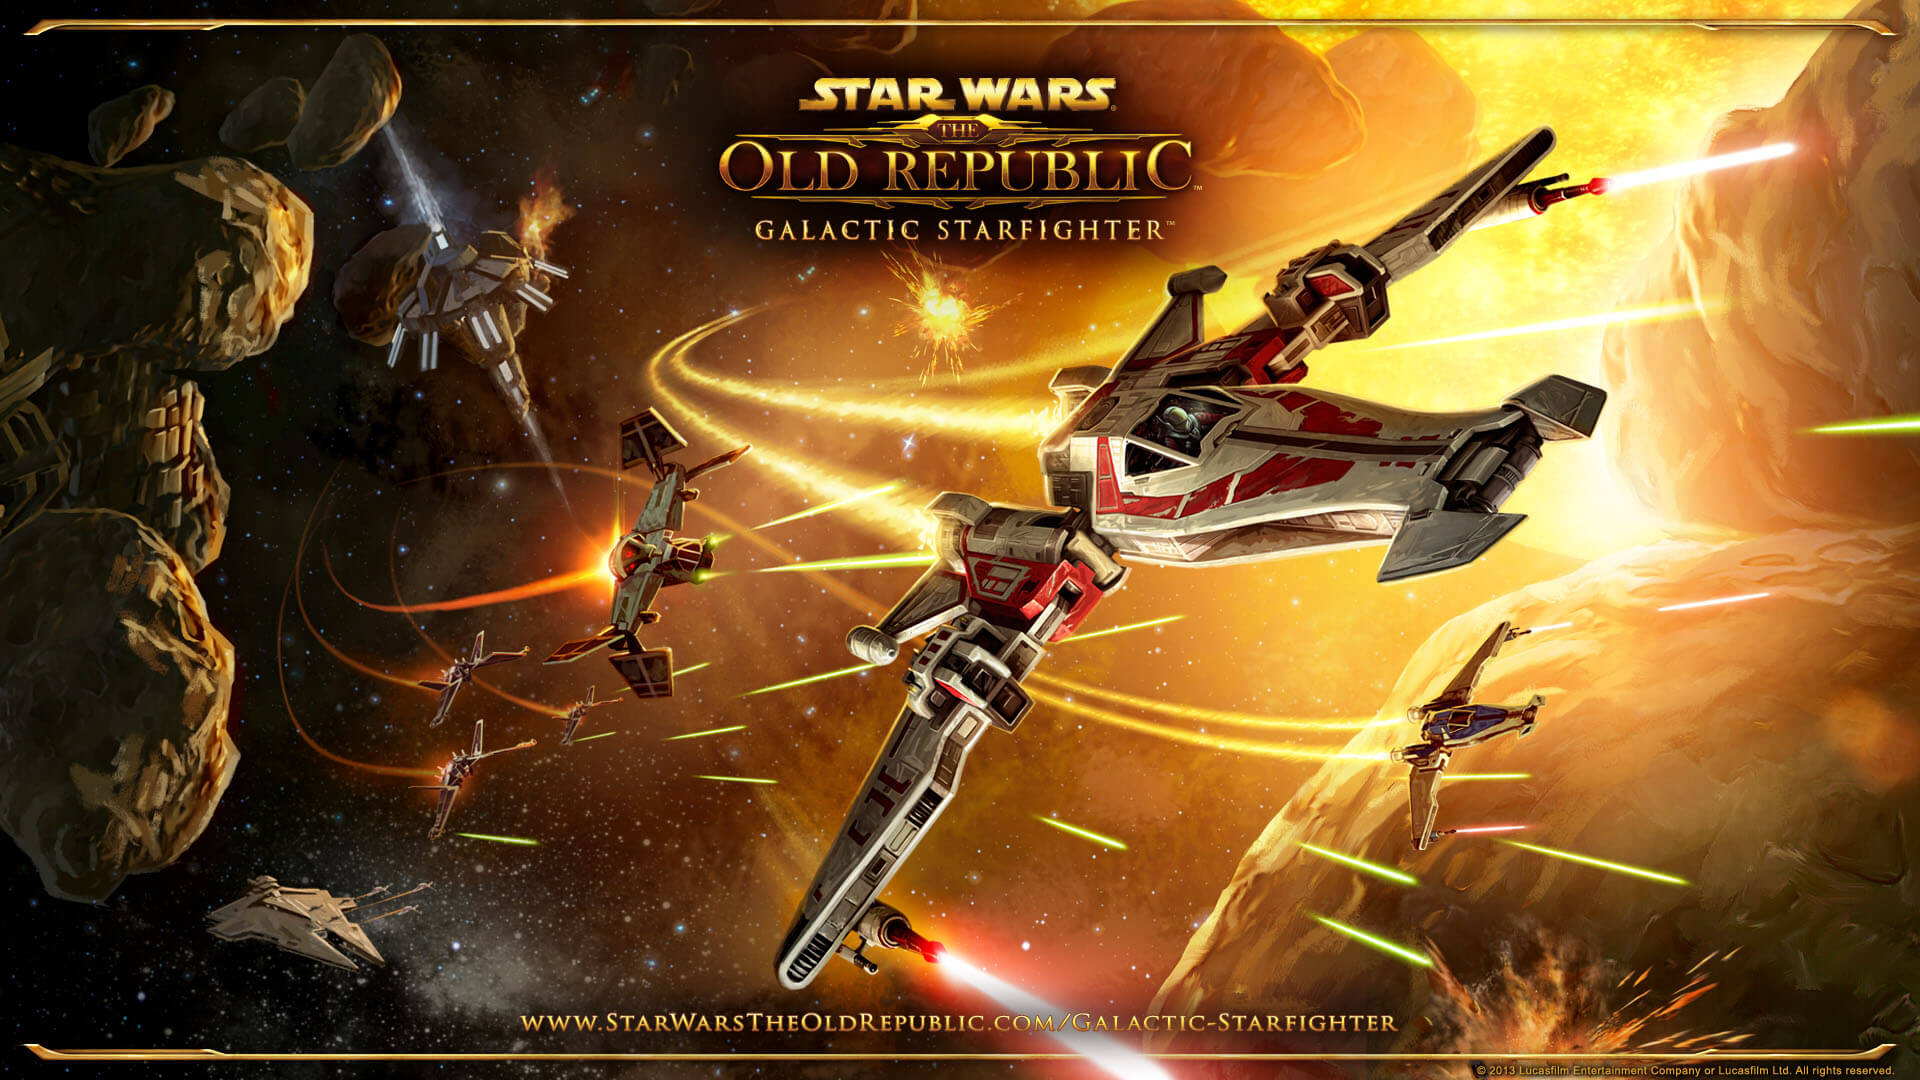 SWTOR: Galactic Starfighter